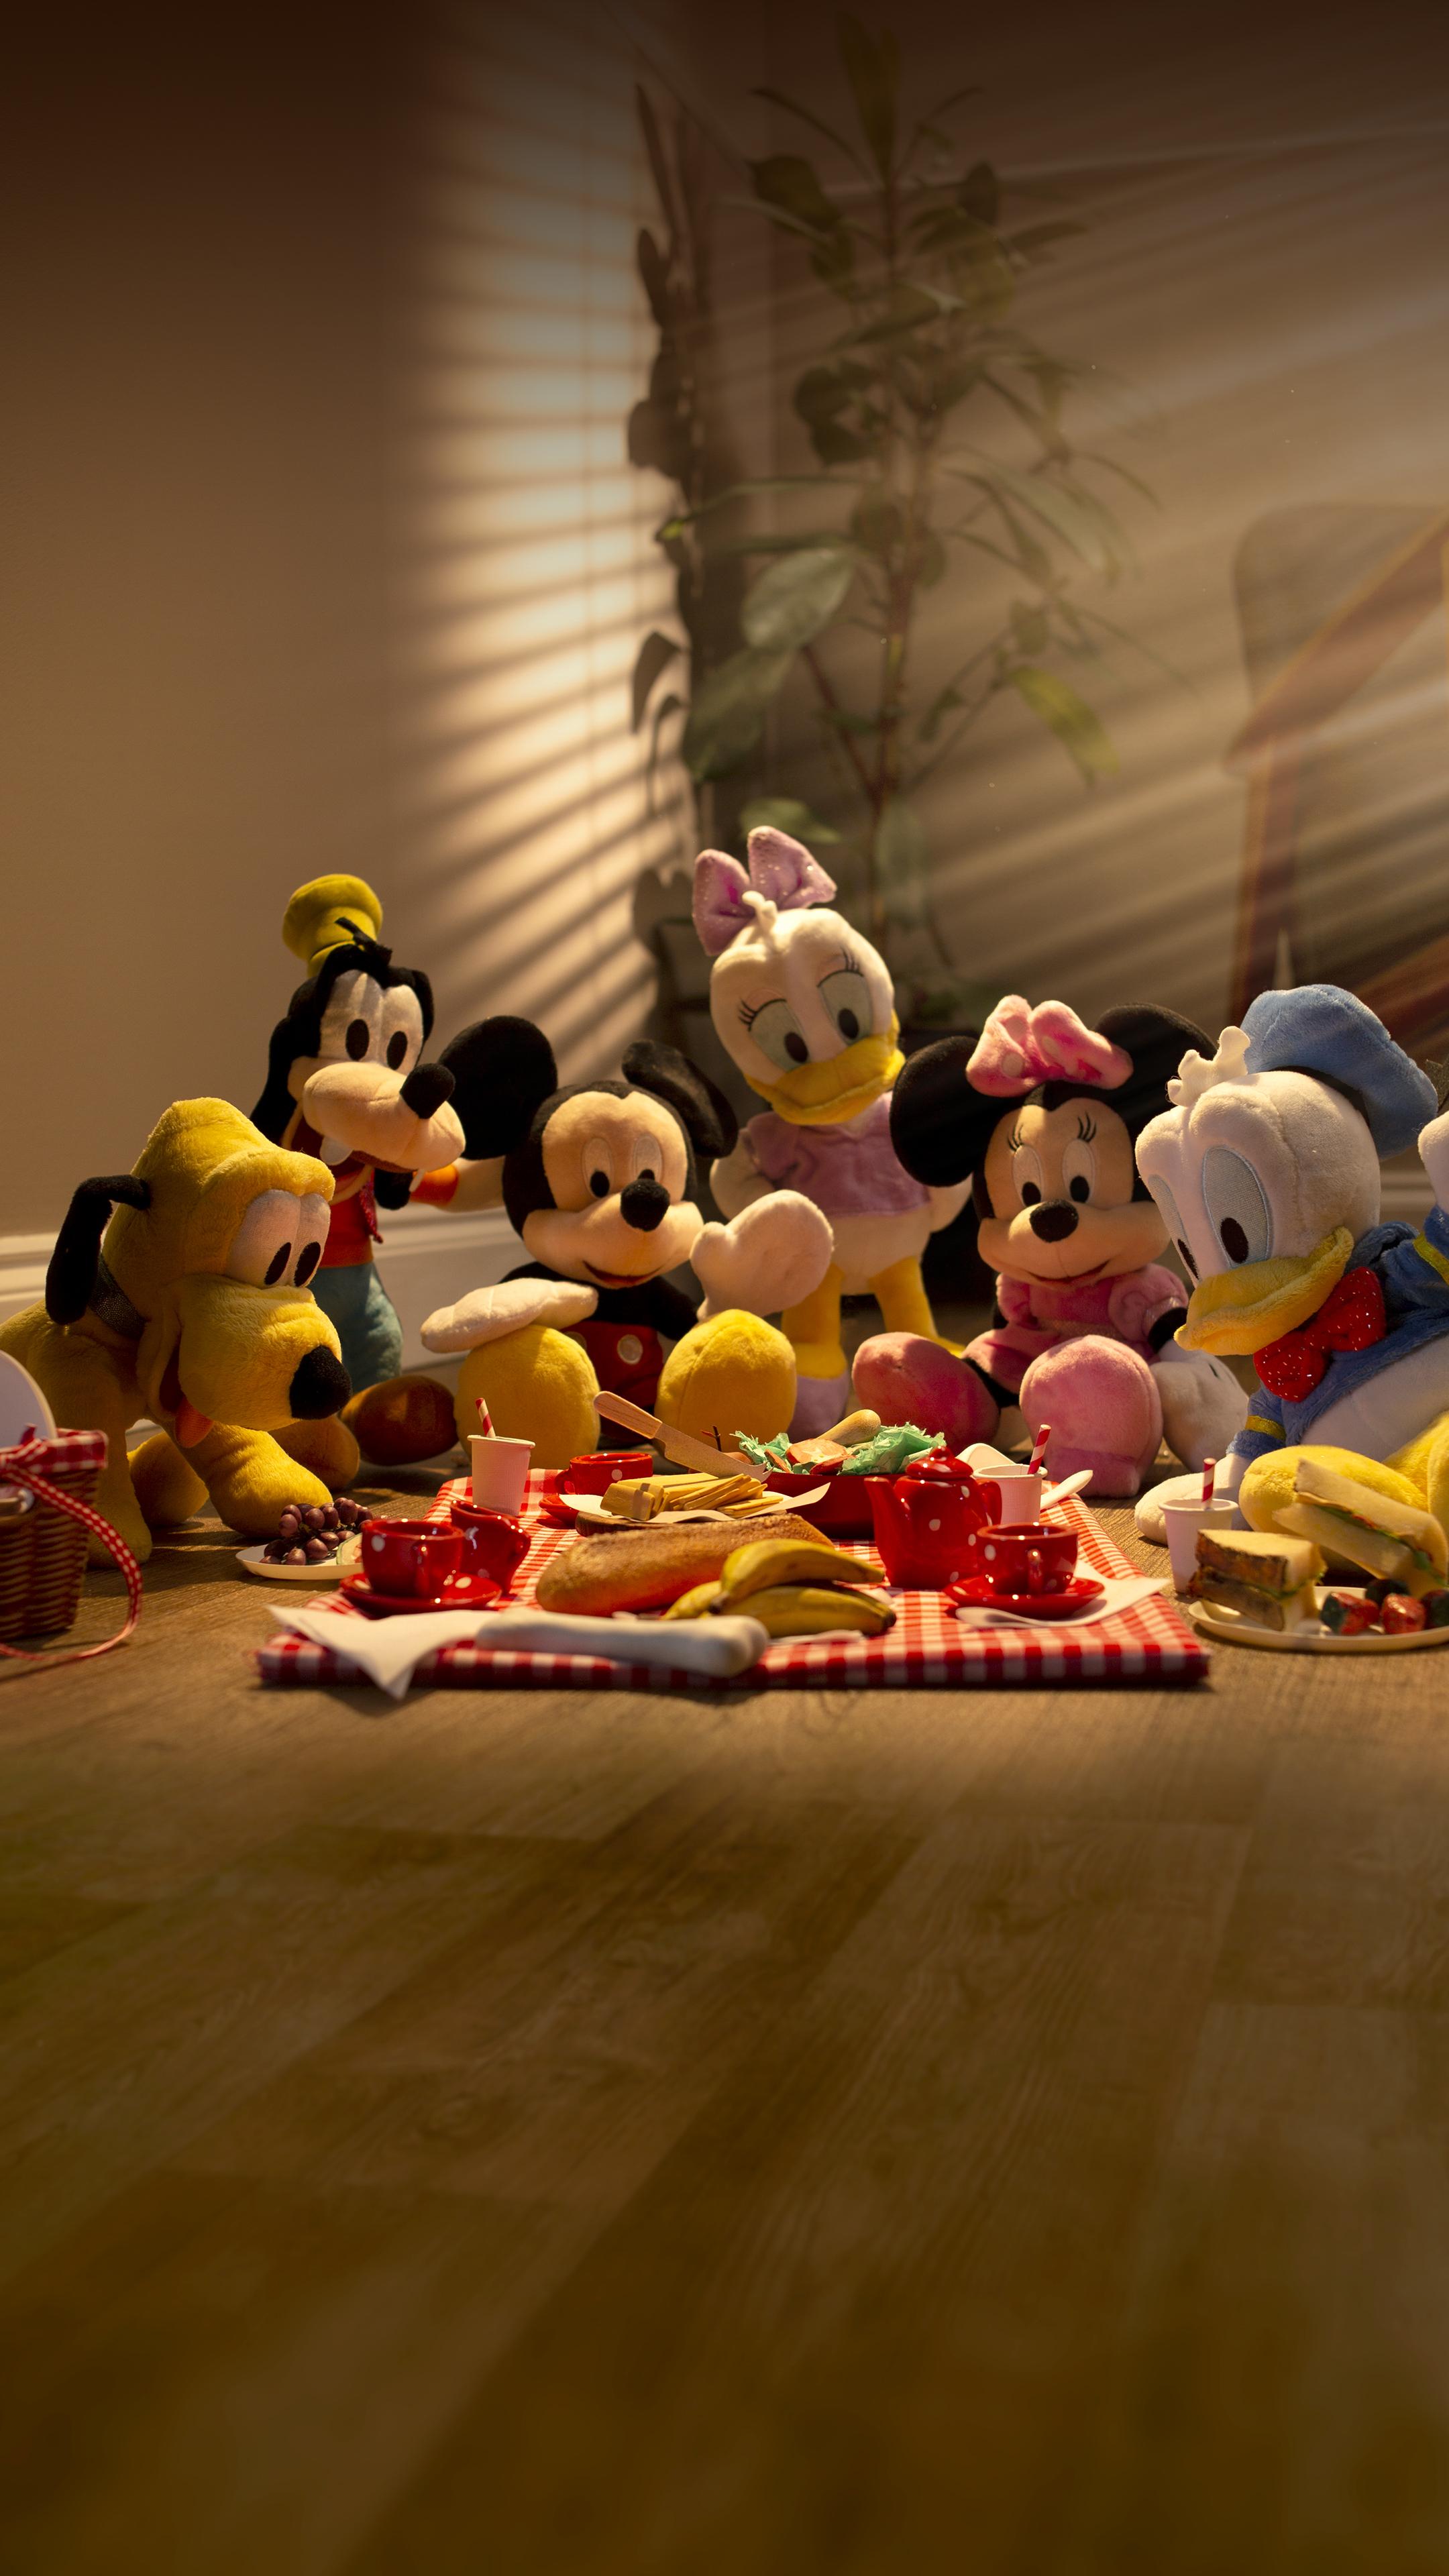 MickeyMouse_ALL_4K.jpg